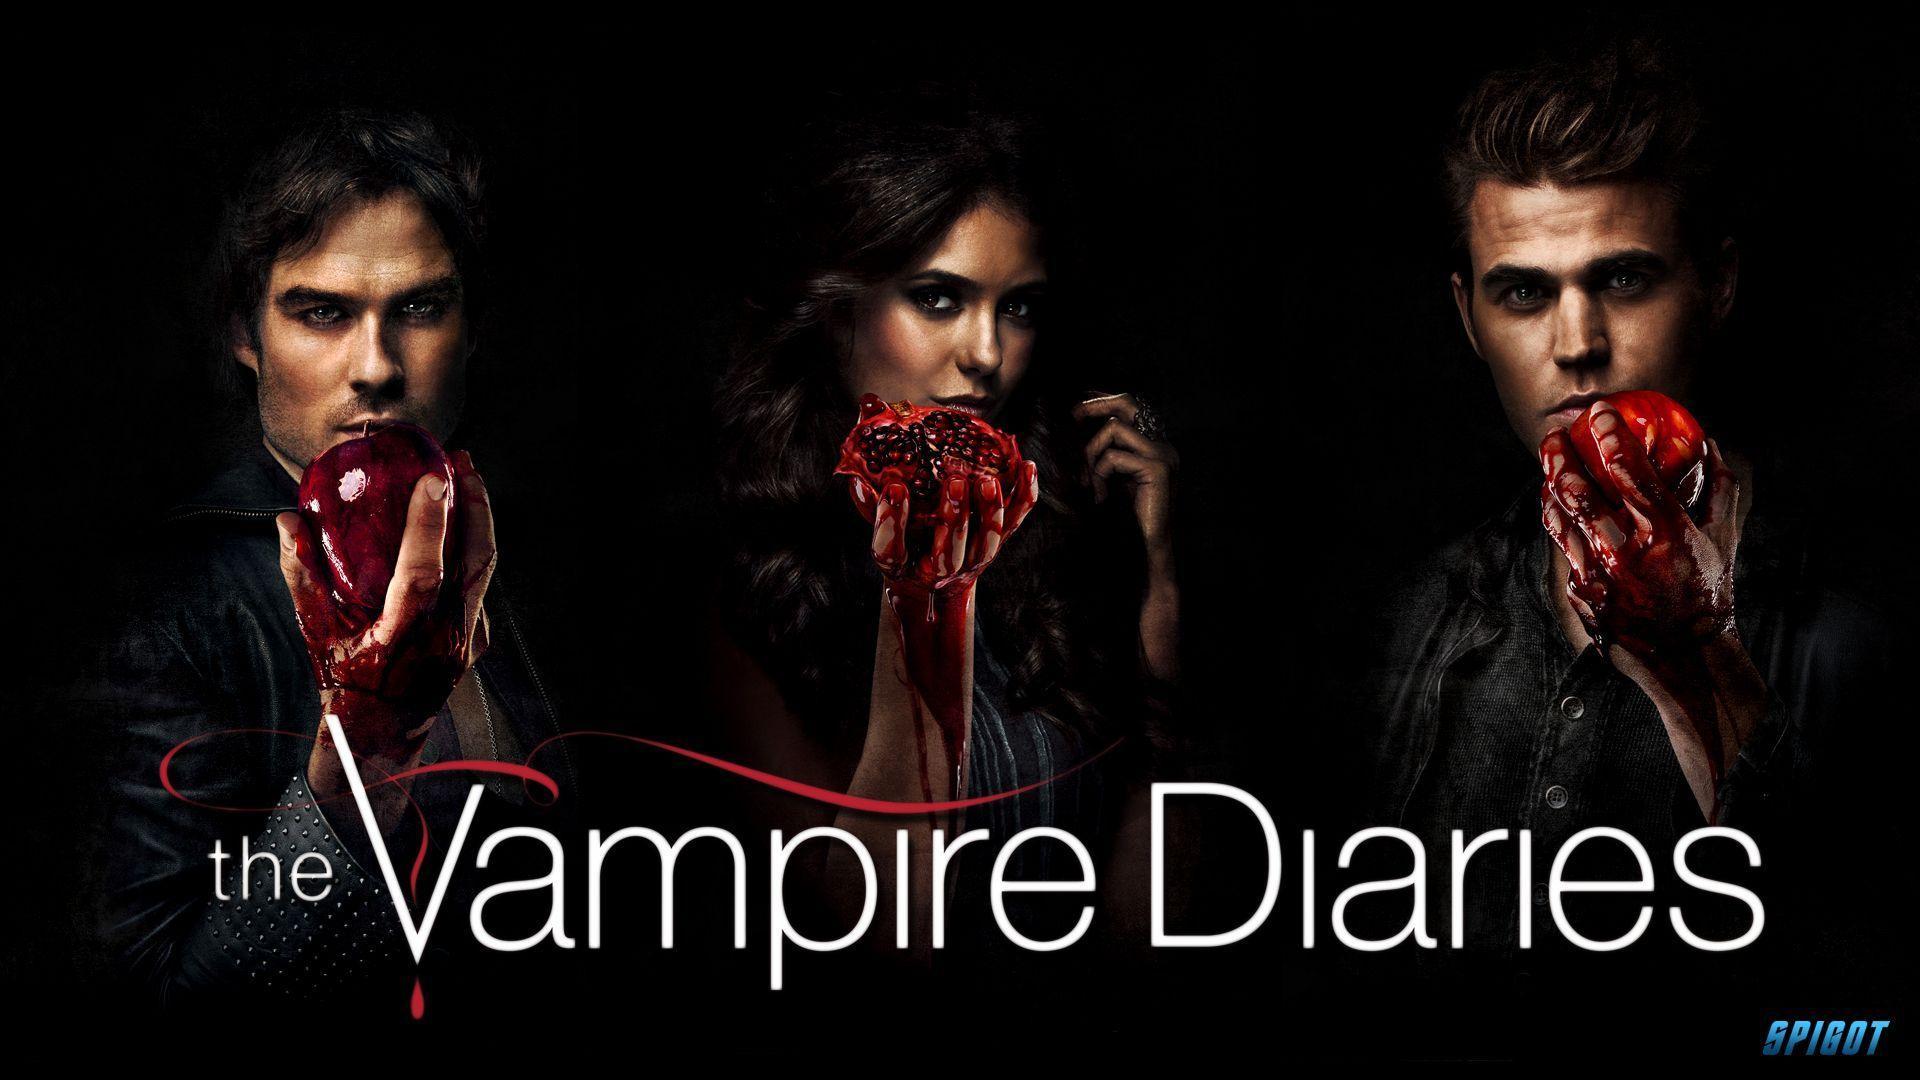 The Vampire Diaries Wallpapers Top Free The Vampire Diaries